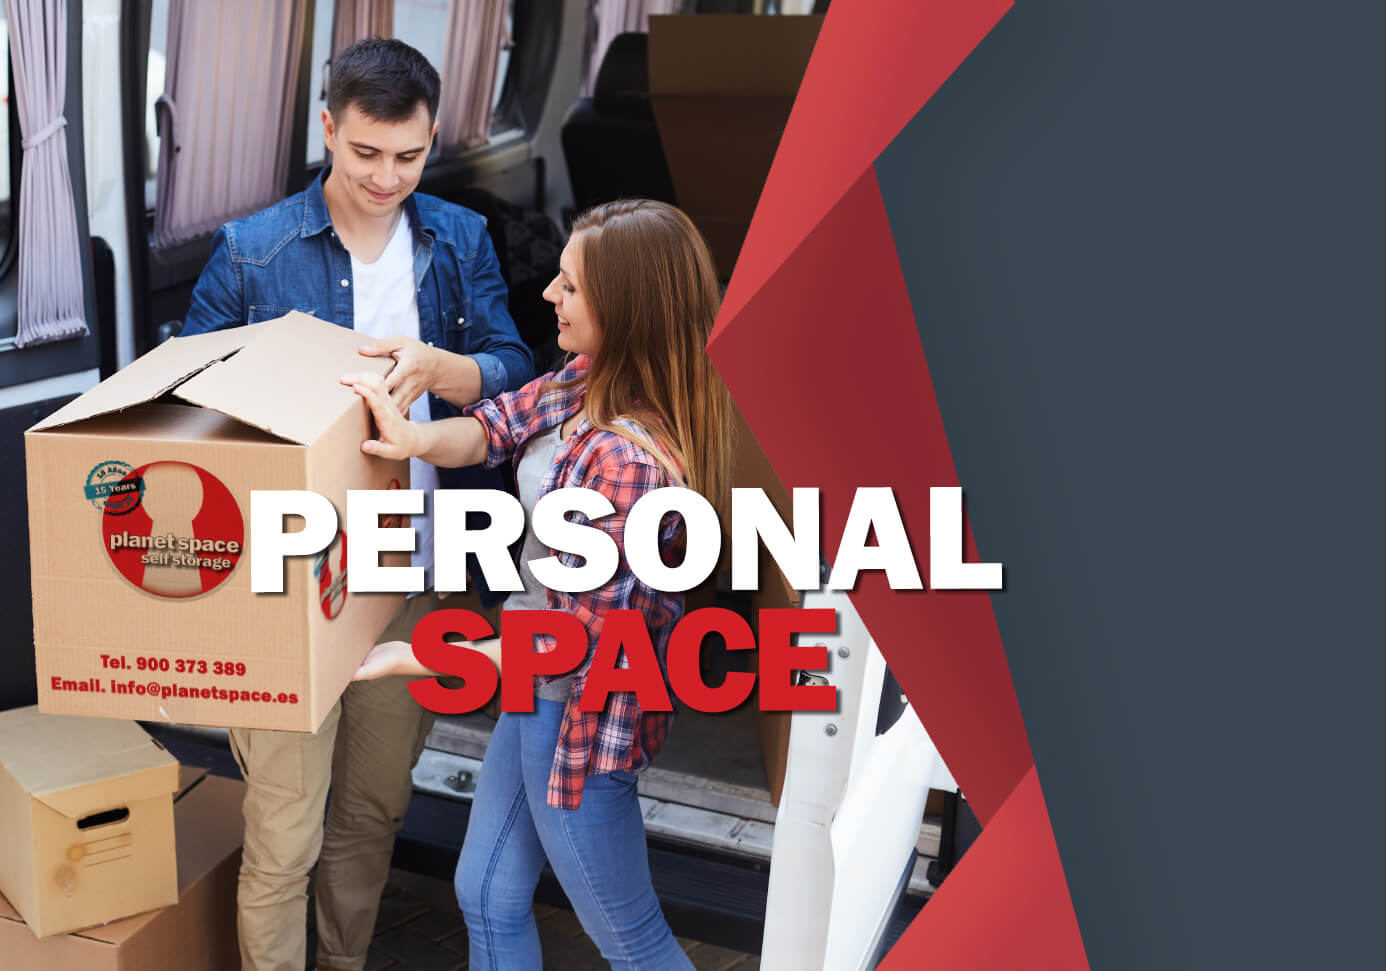 planetspacestorage-personalspace